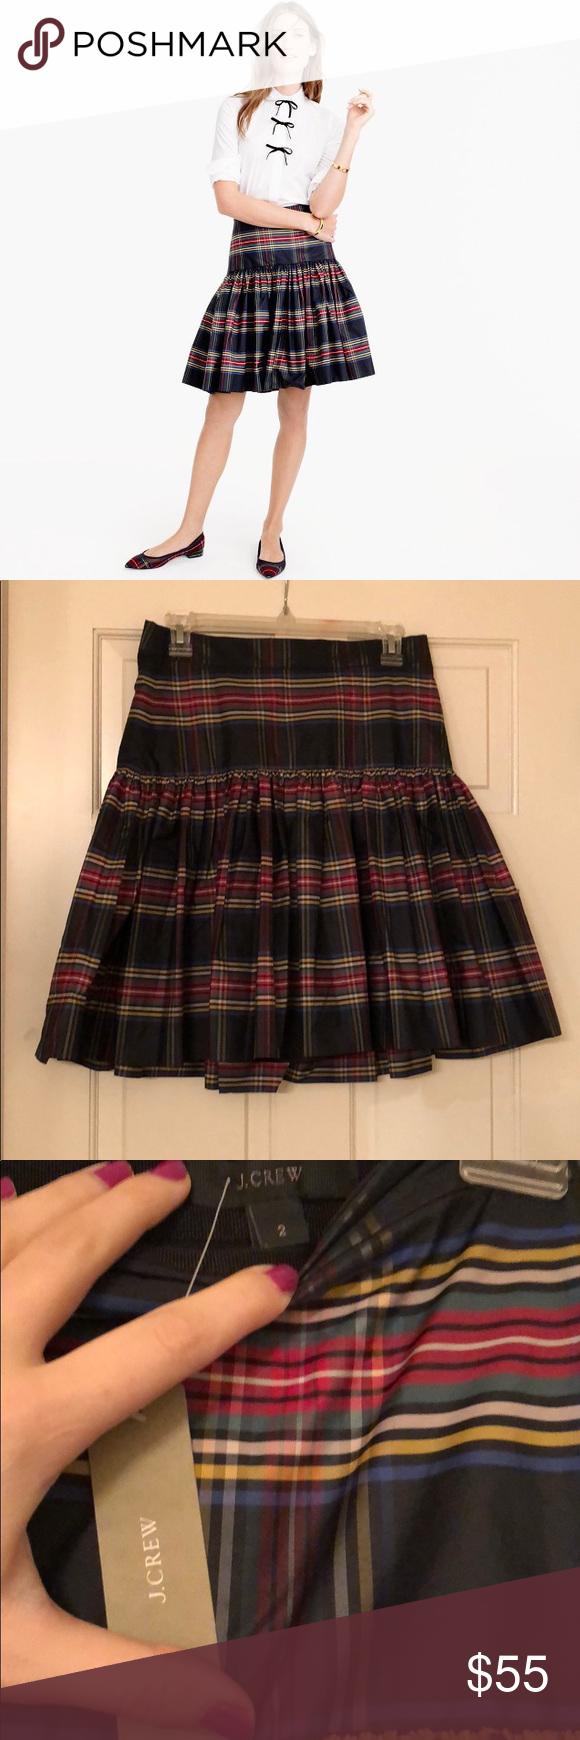 J. Crew skirt J. Crew taffeta, holiday plaid, drop-waist skirt. J. Crew Skirts